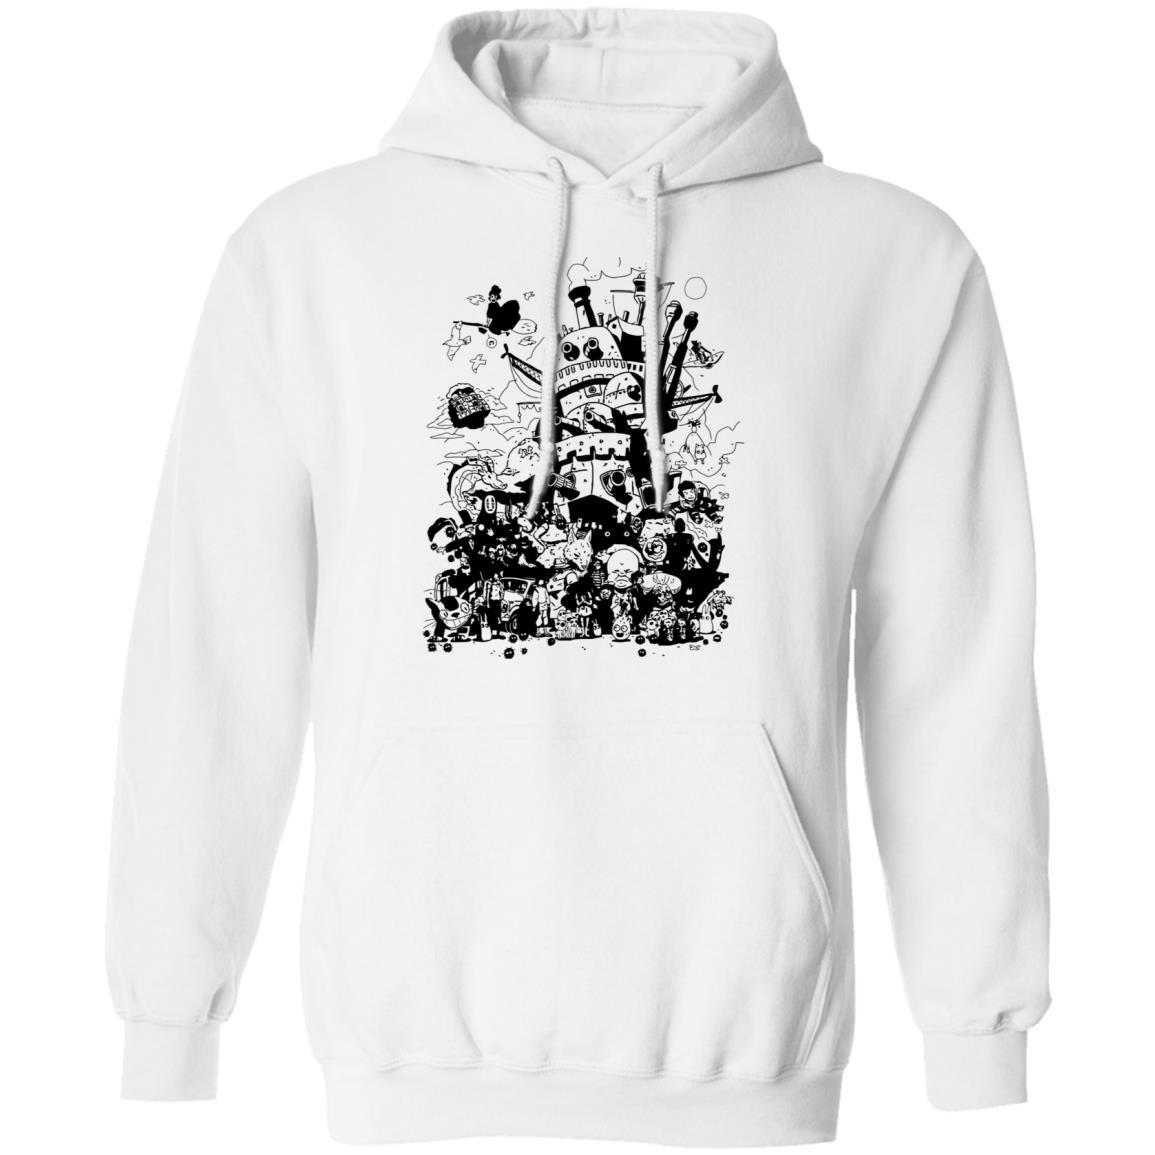 Studio Ghibli Art Collection Black and White Hoodie